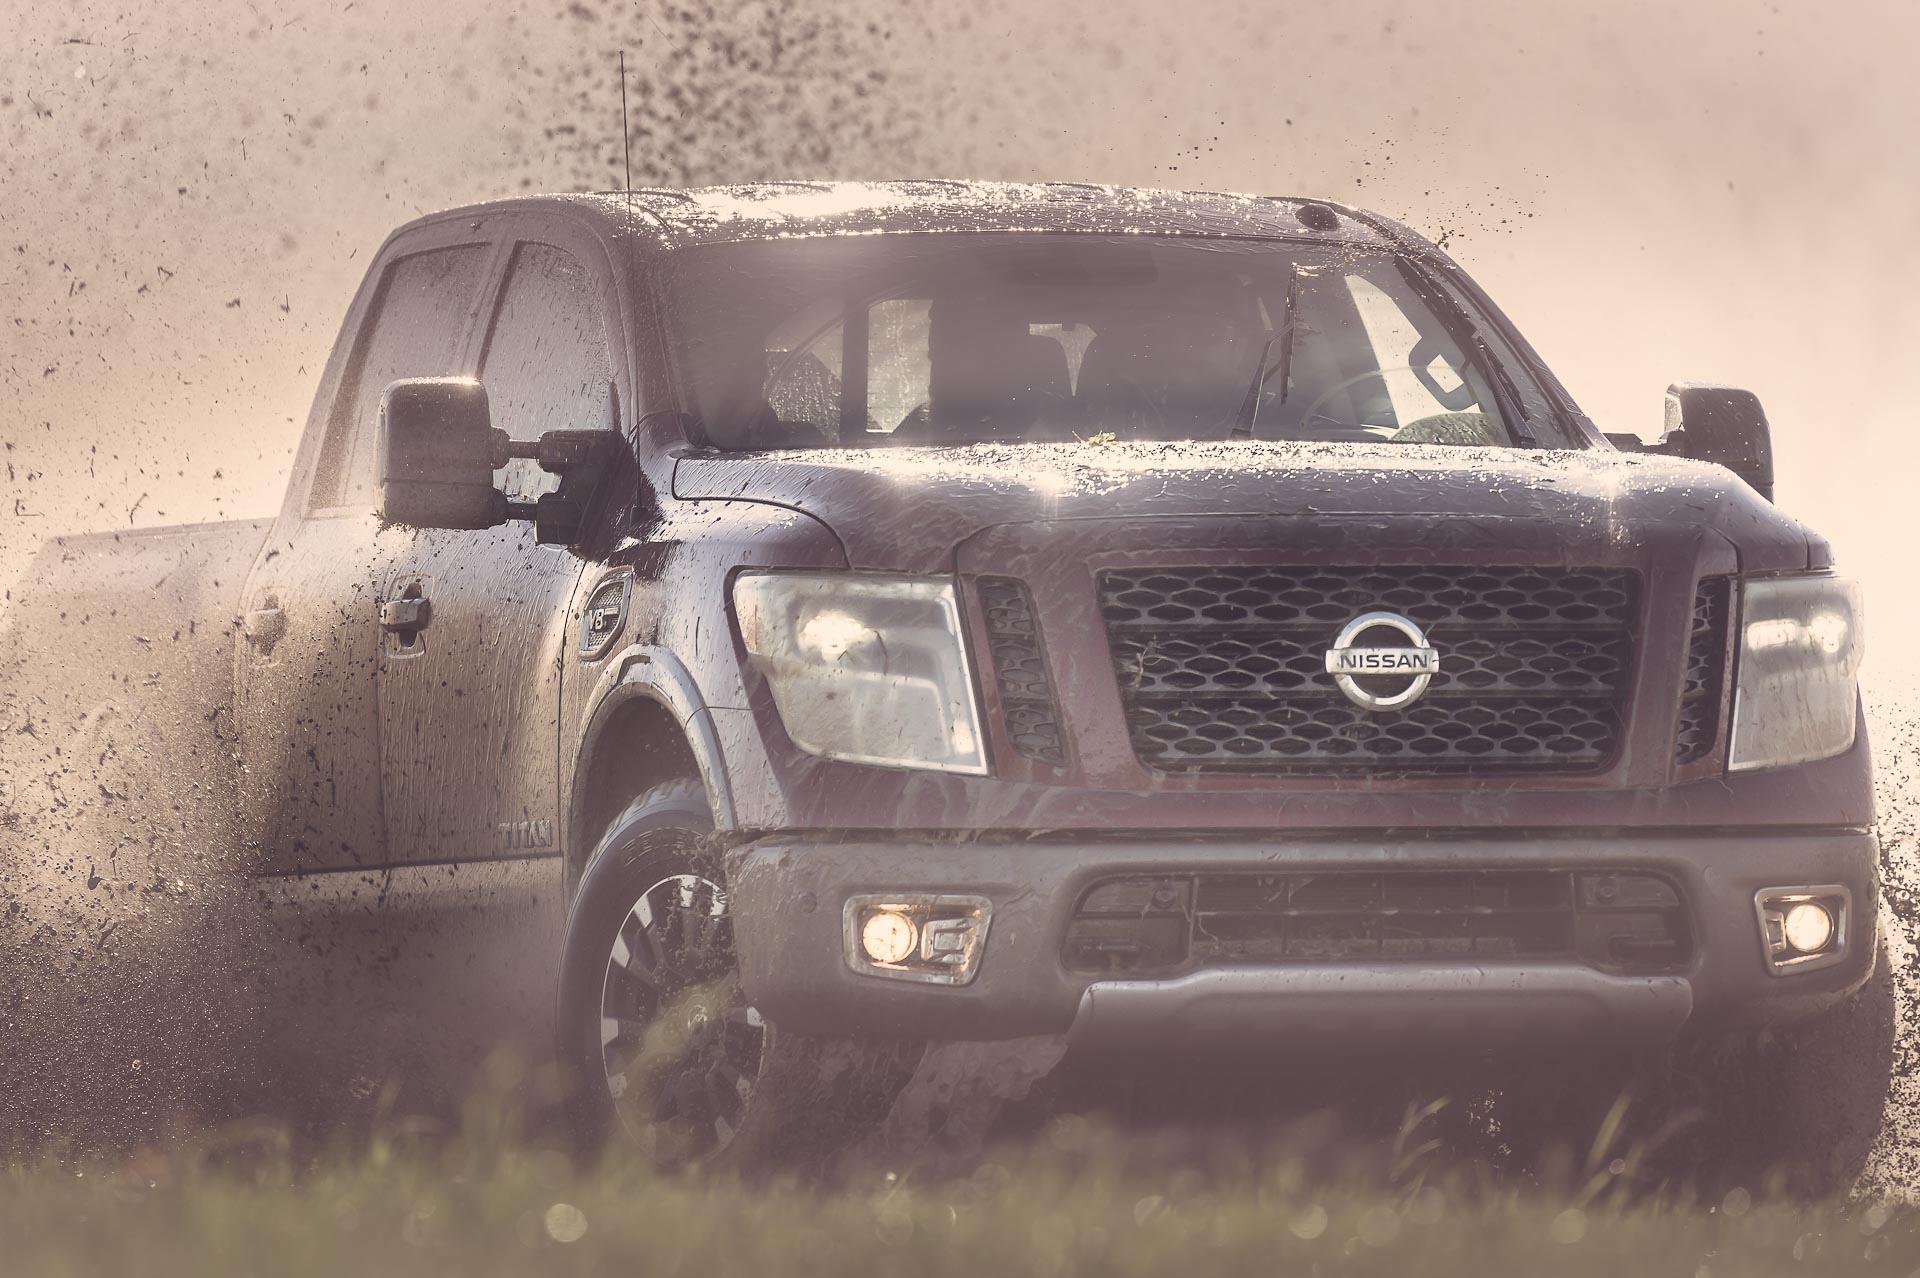 Nissan Titan in the mud. © Tony Bynum